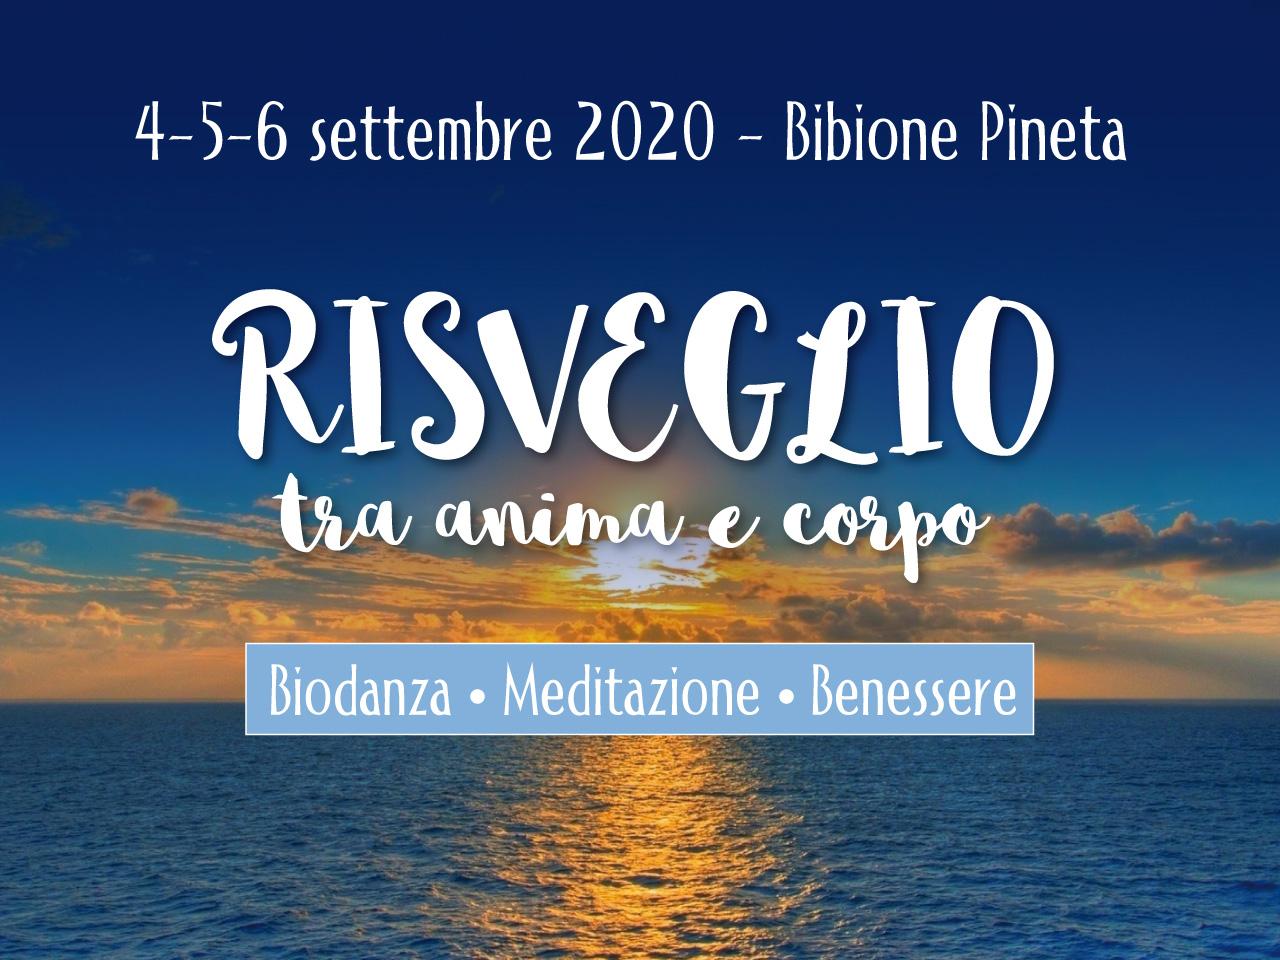 https://meditaedanza.com/wp-content/uploads/2020/09/eventi-sitoweb-1280x960-1.jpg